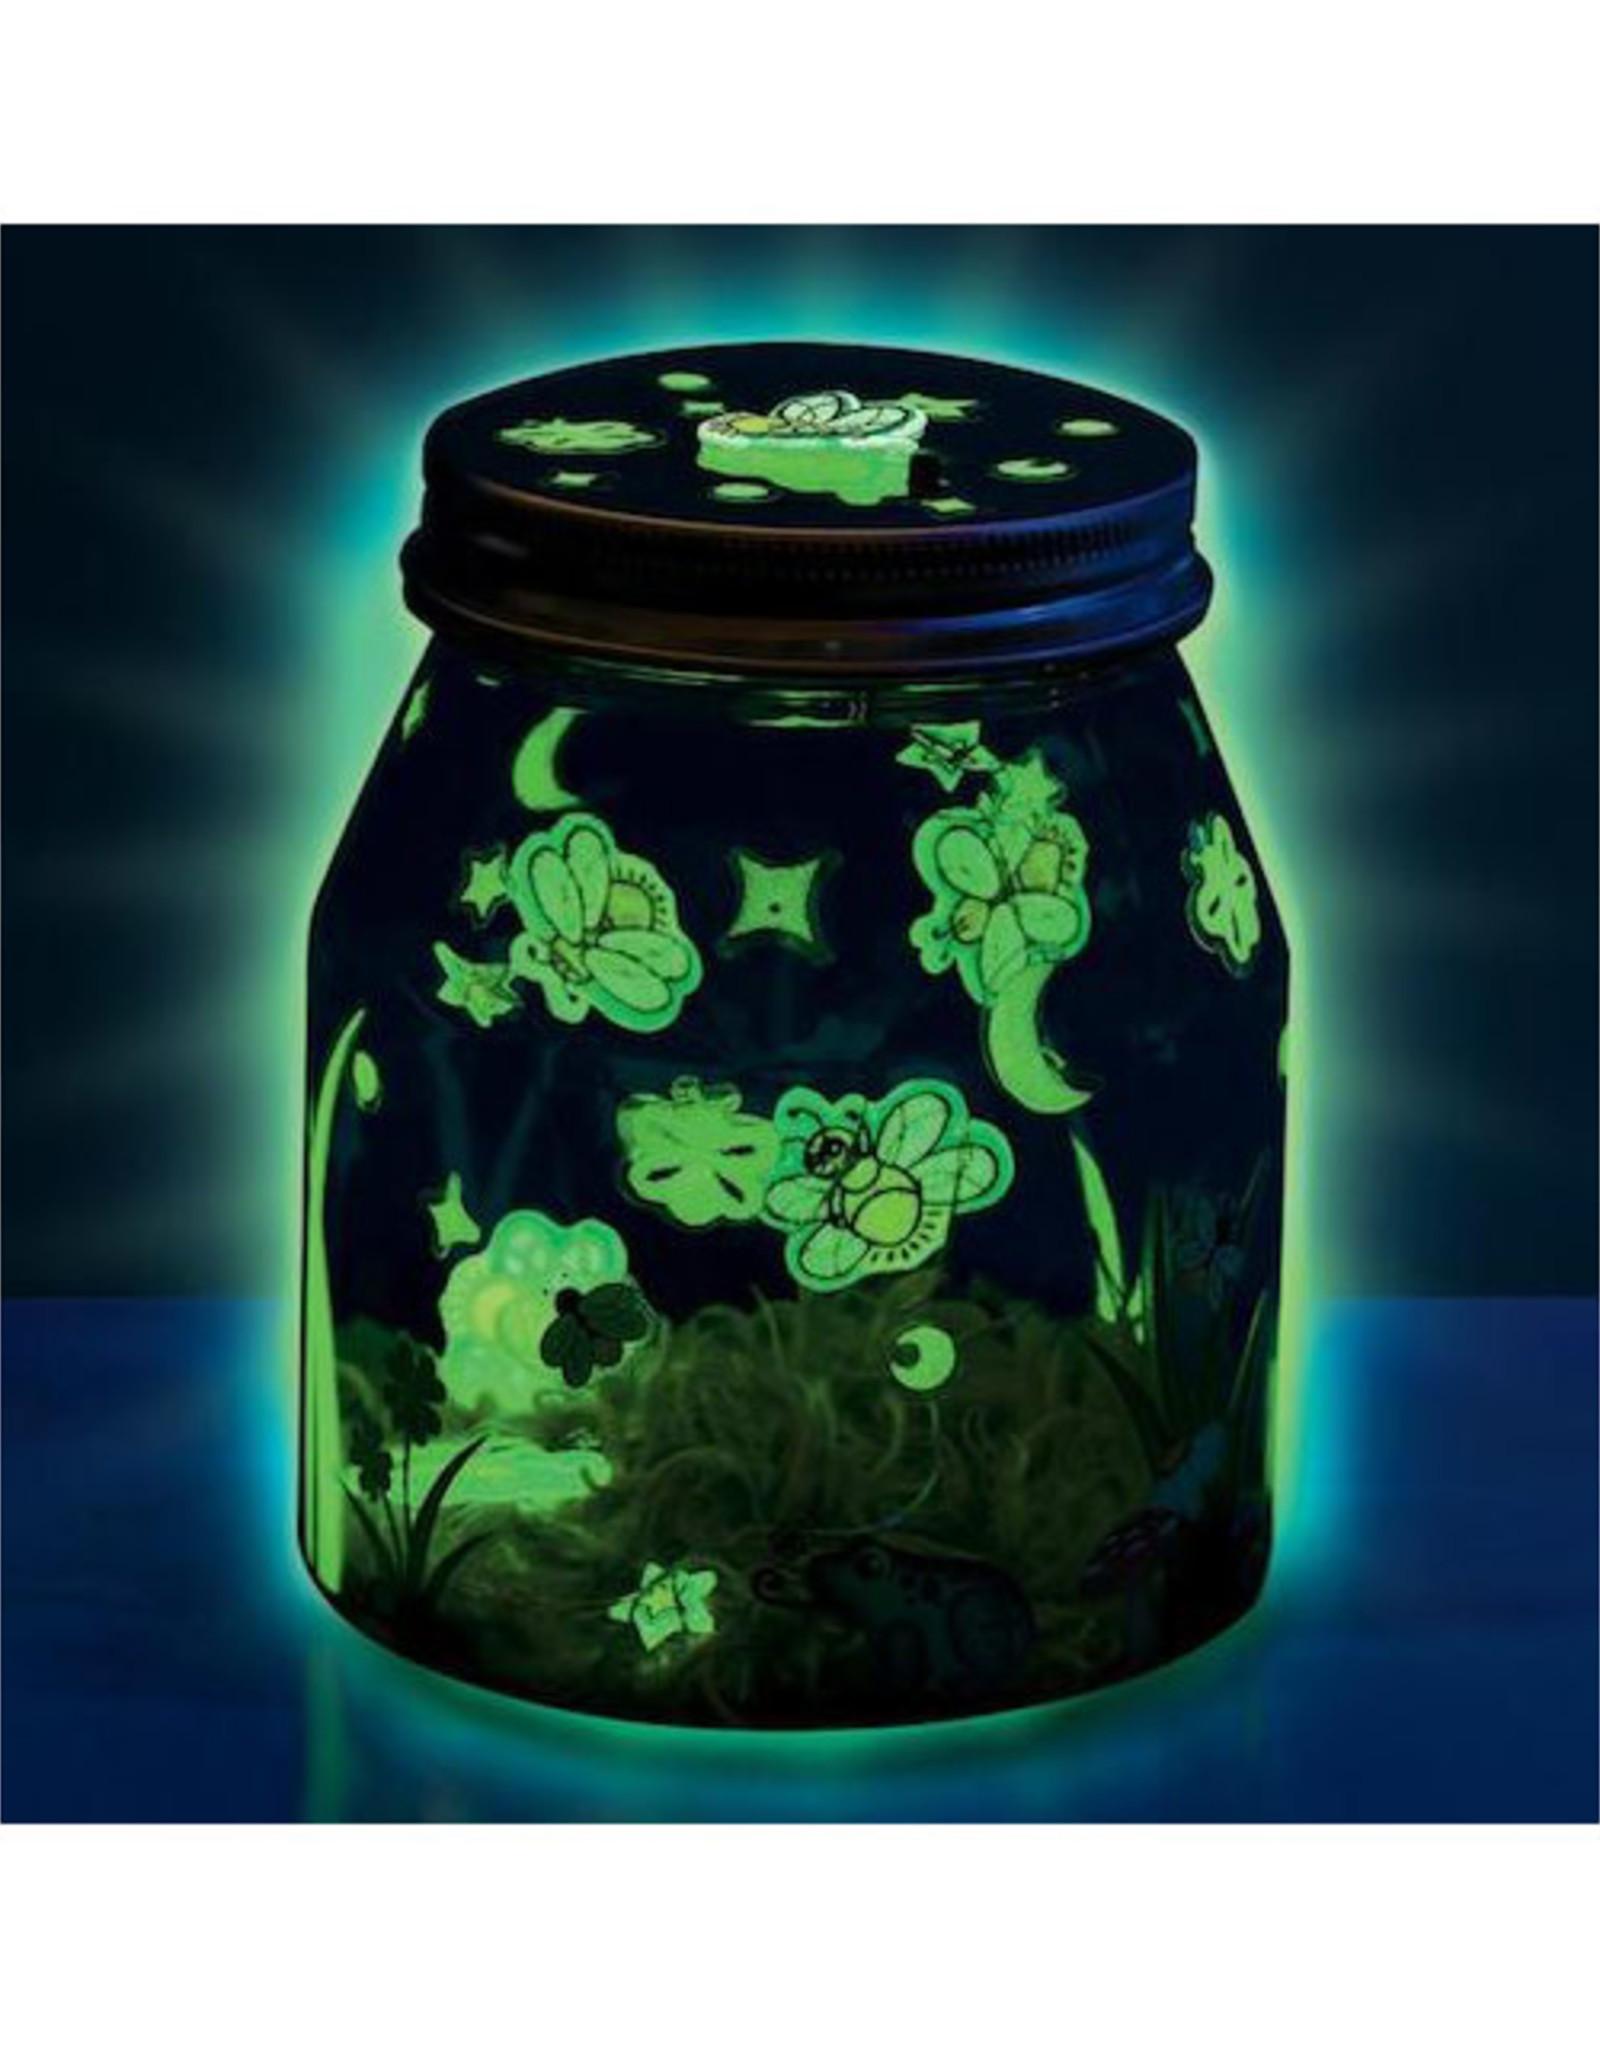 Faber Castell Make Your Own Firefly Light